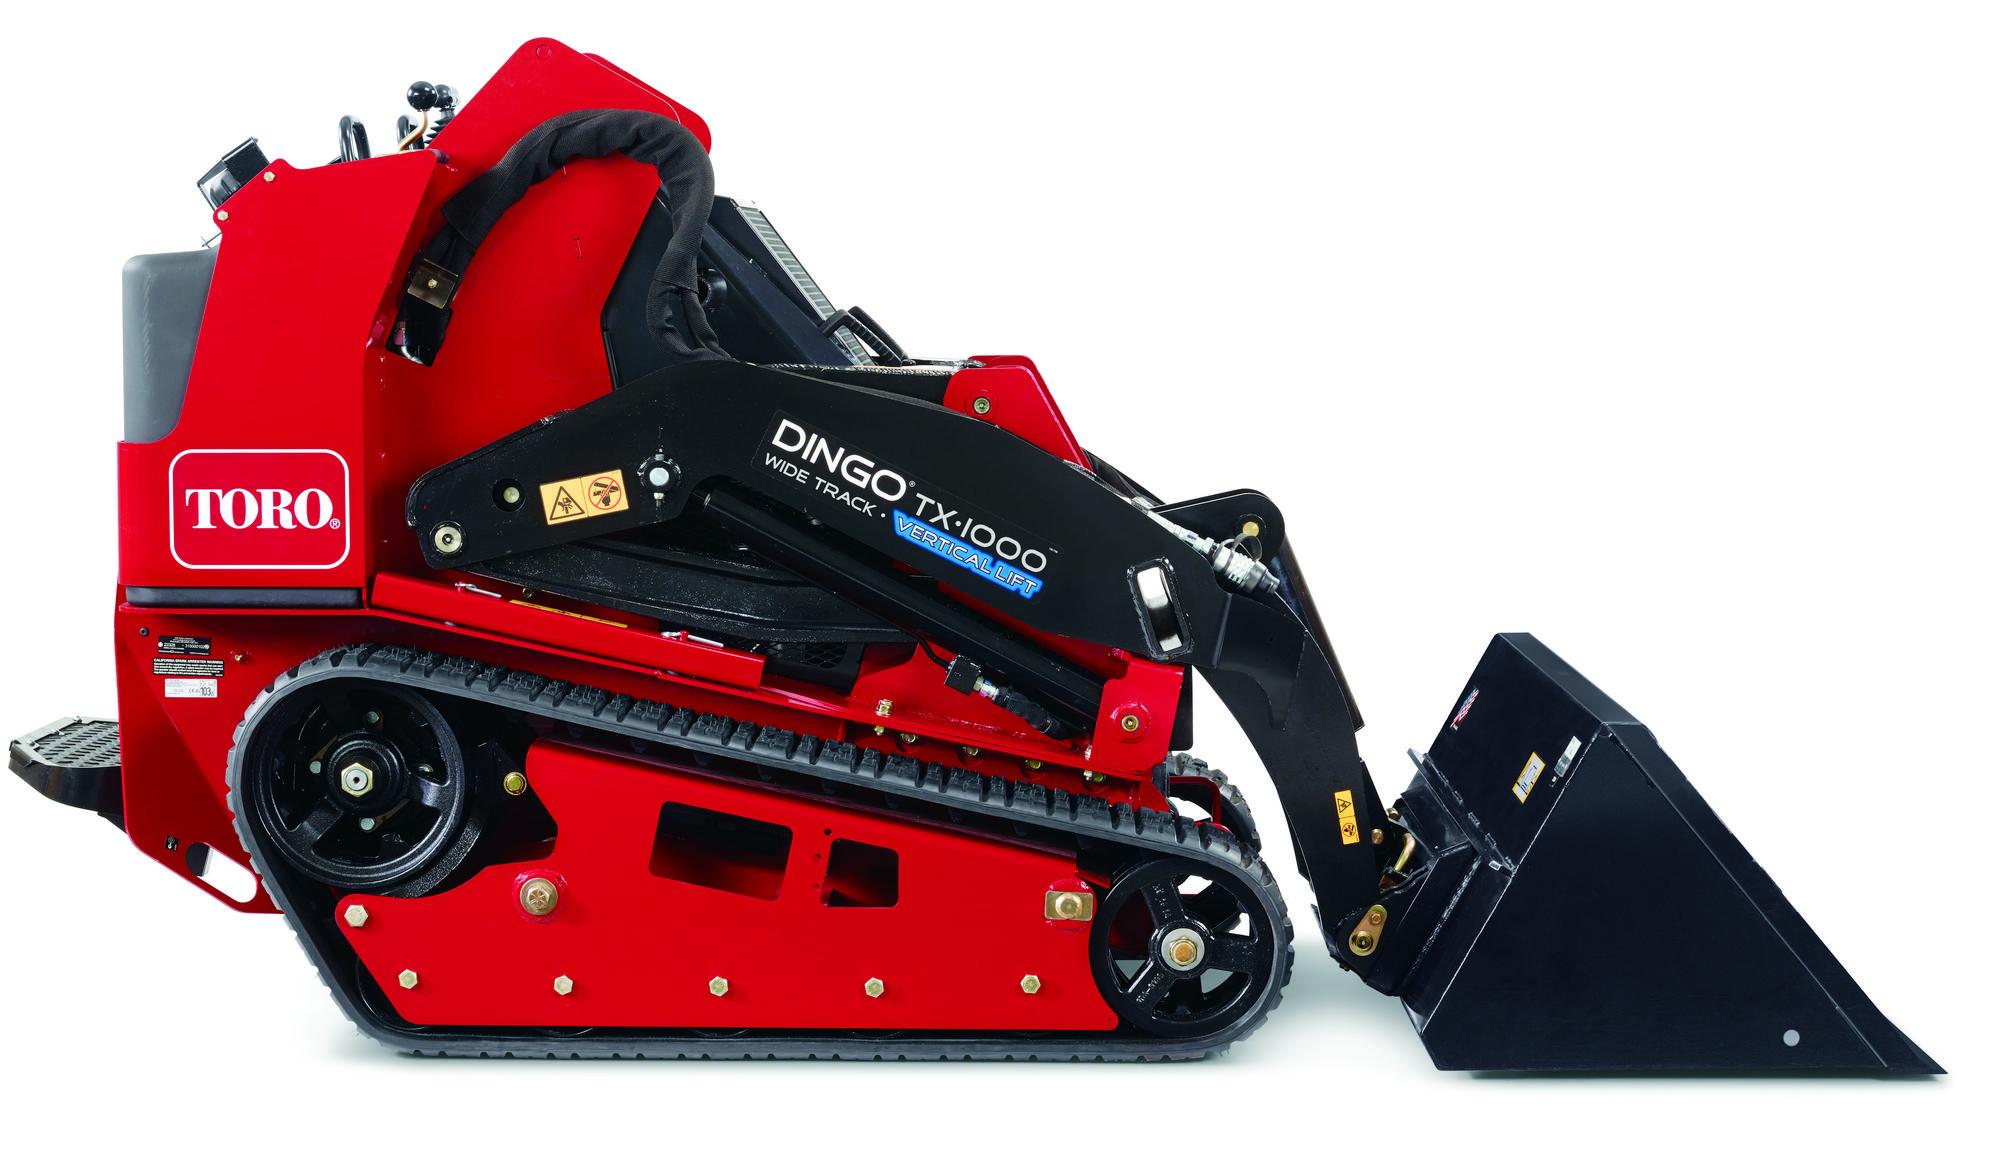 Toro Dingo 22327 TX1000 Narrow Track Compact Utility Loader